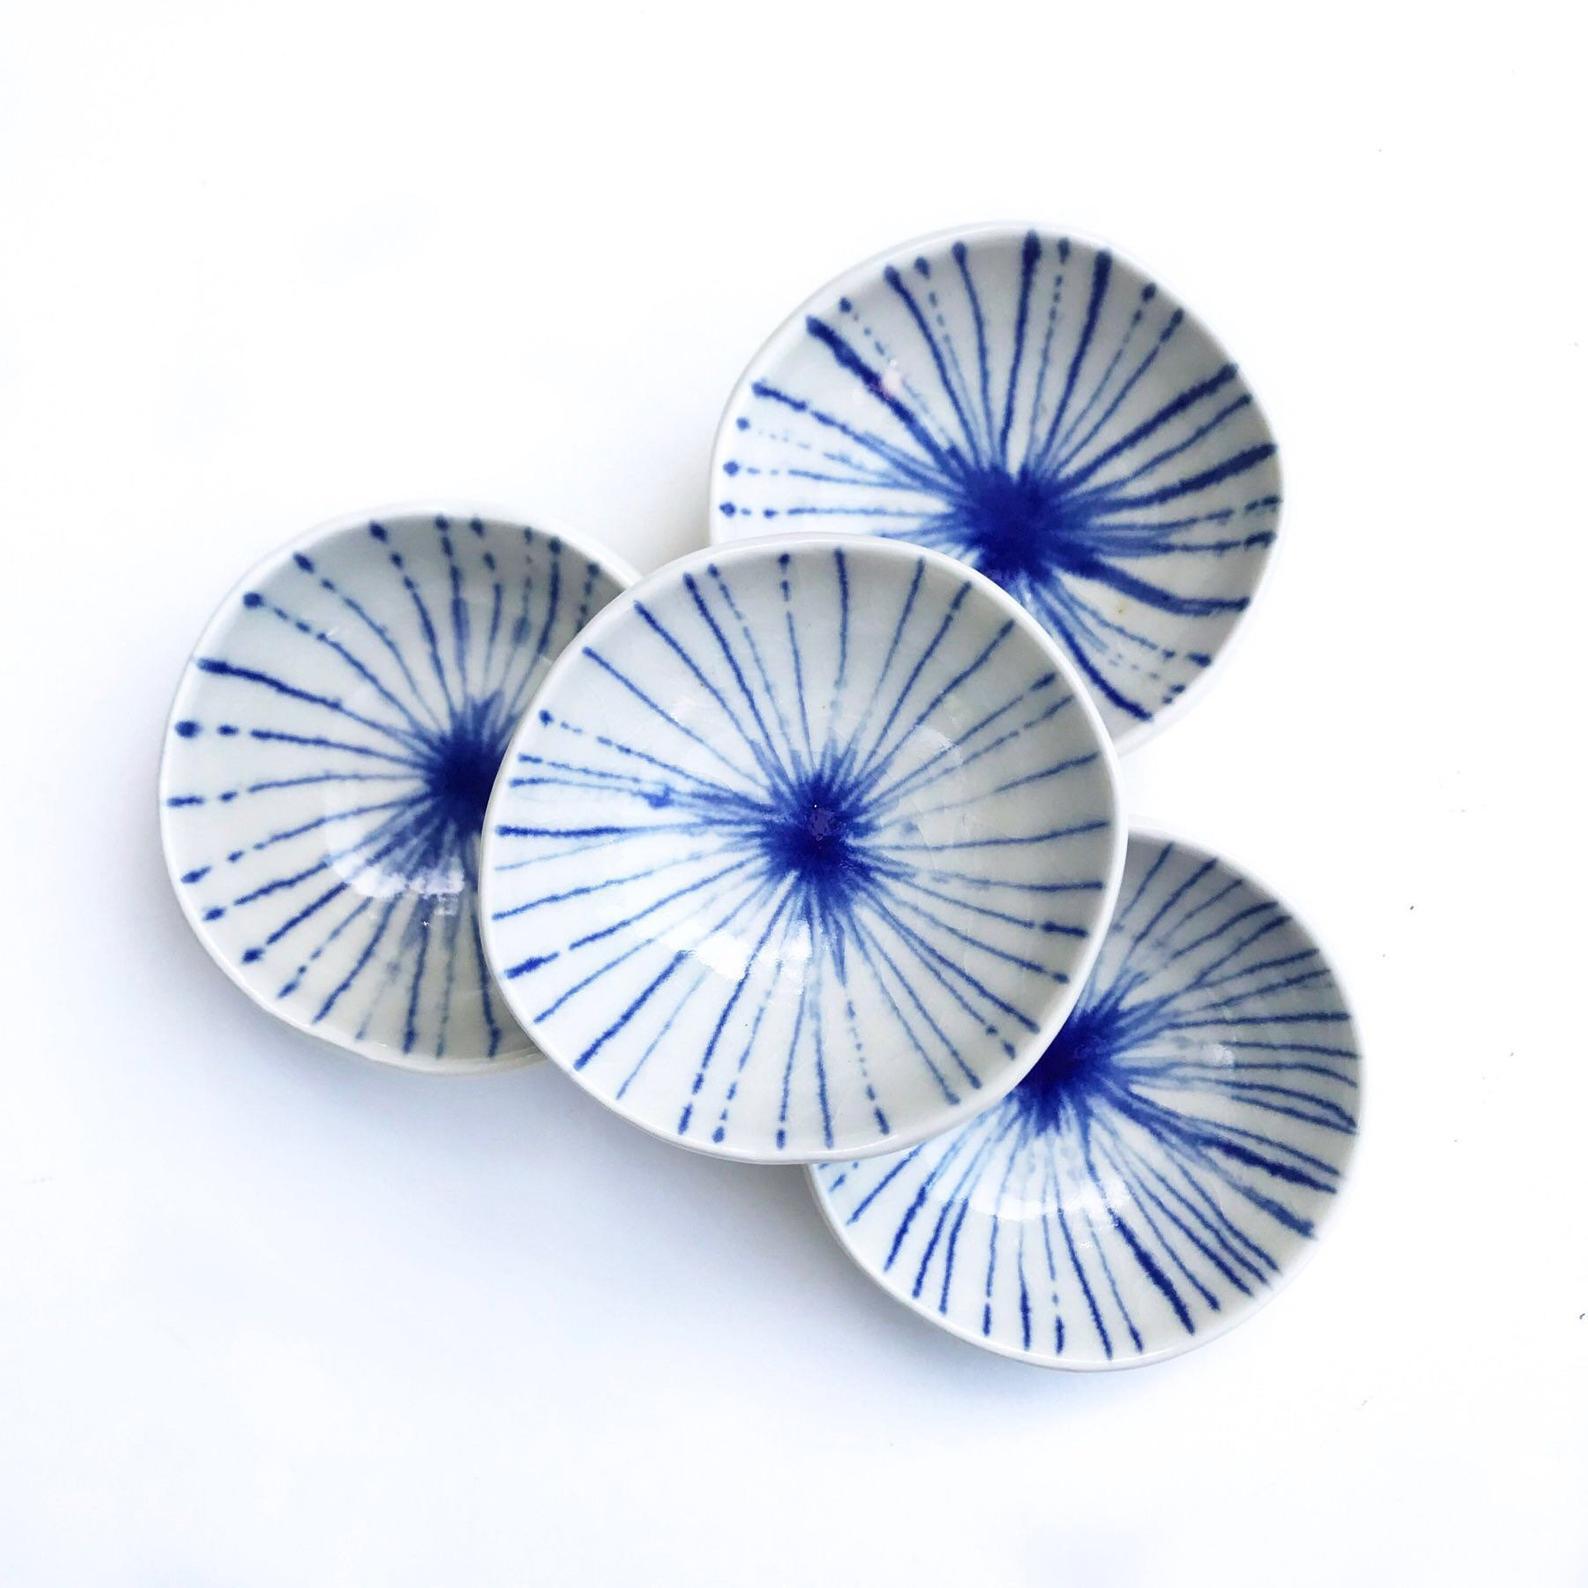 Sea Urchin Pinch Bowl